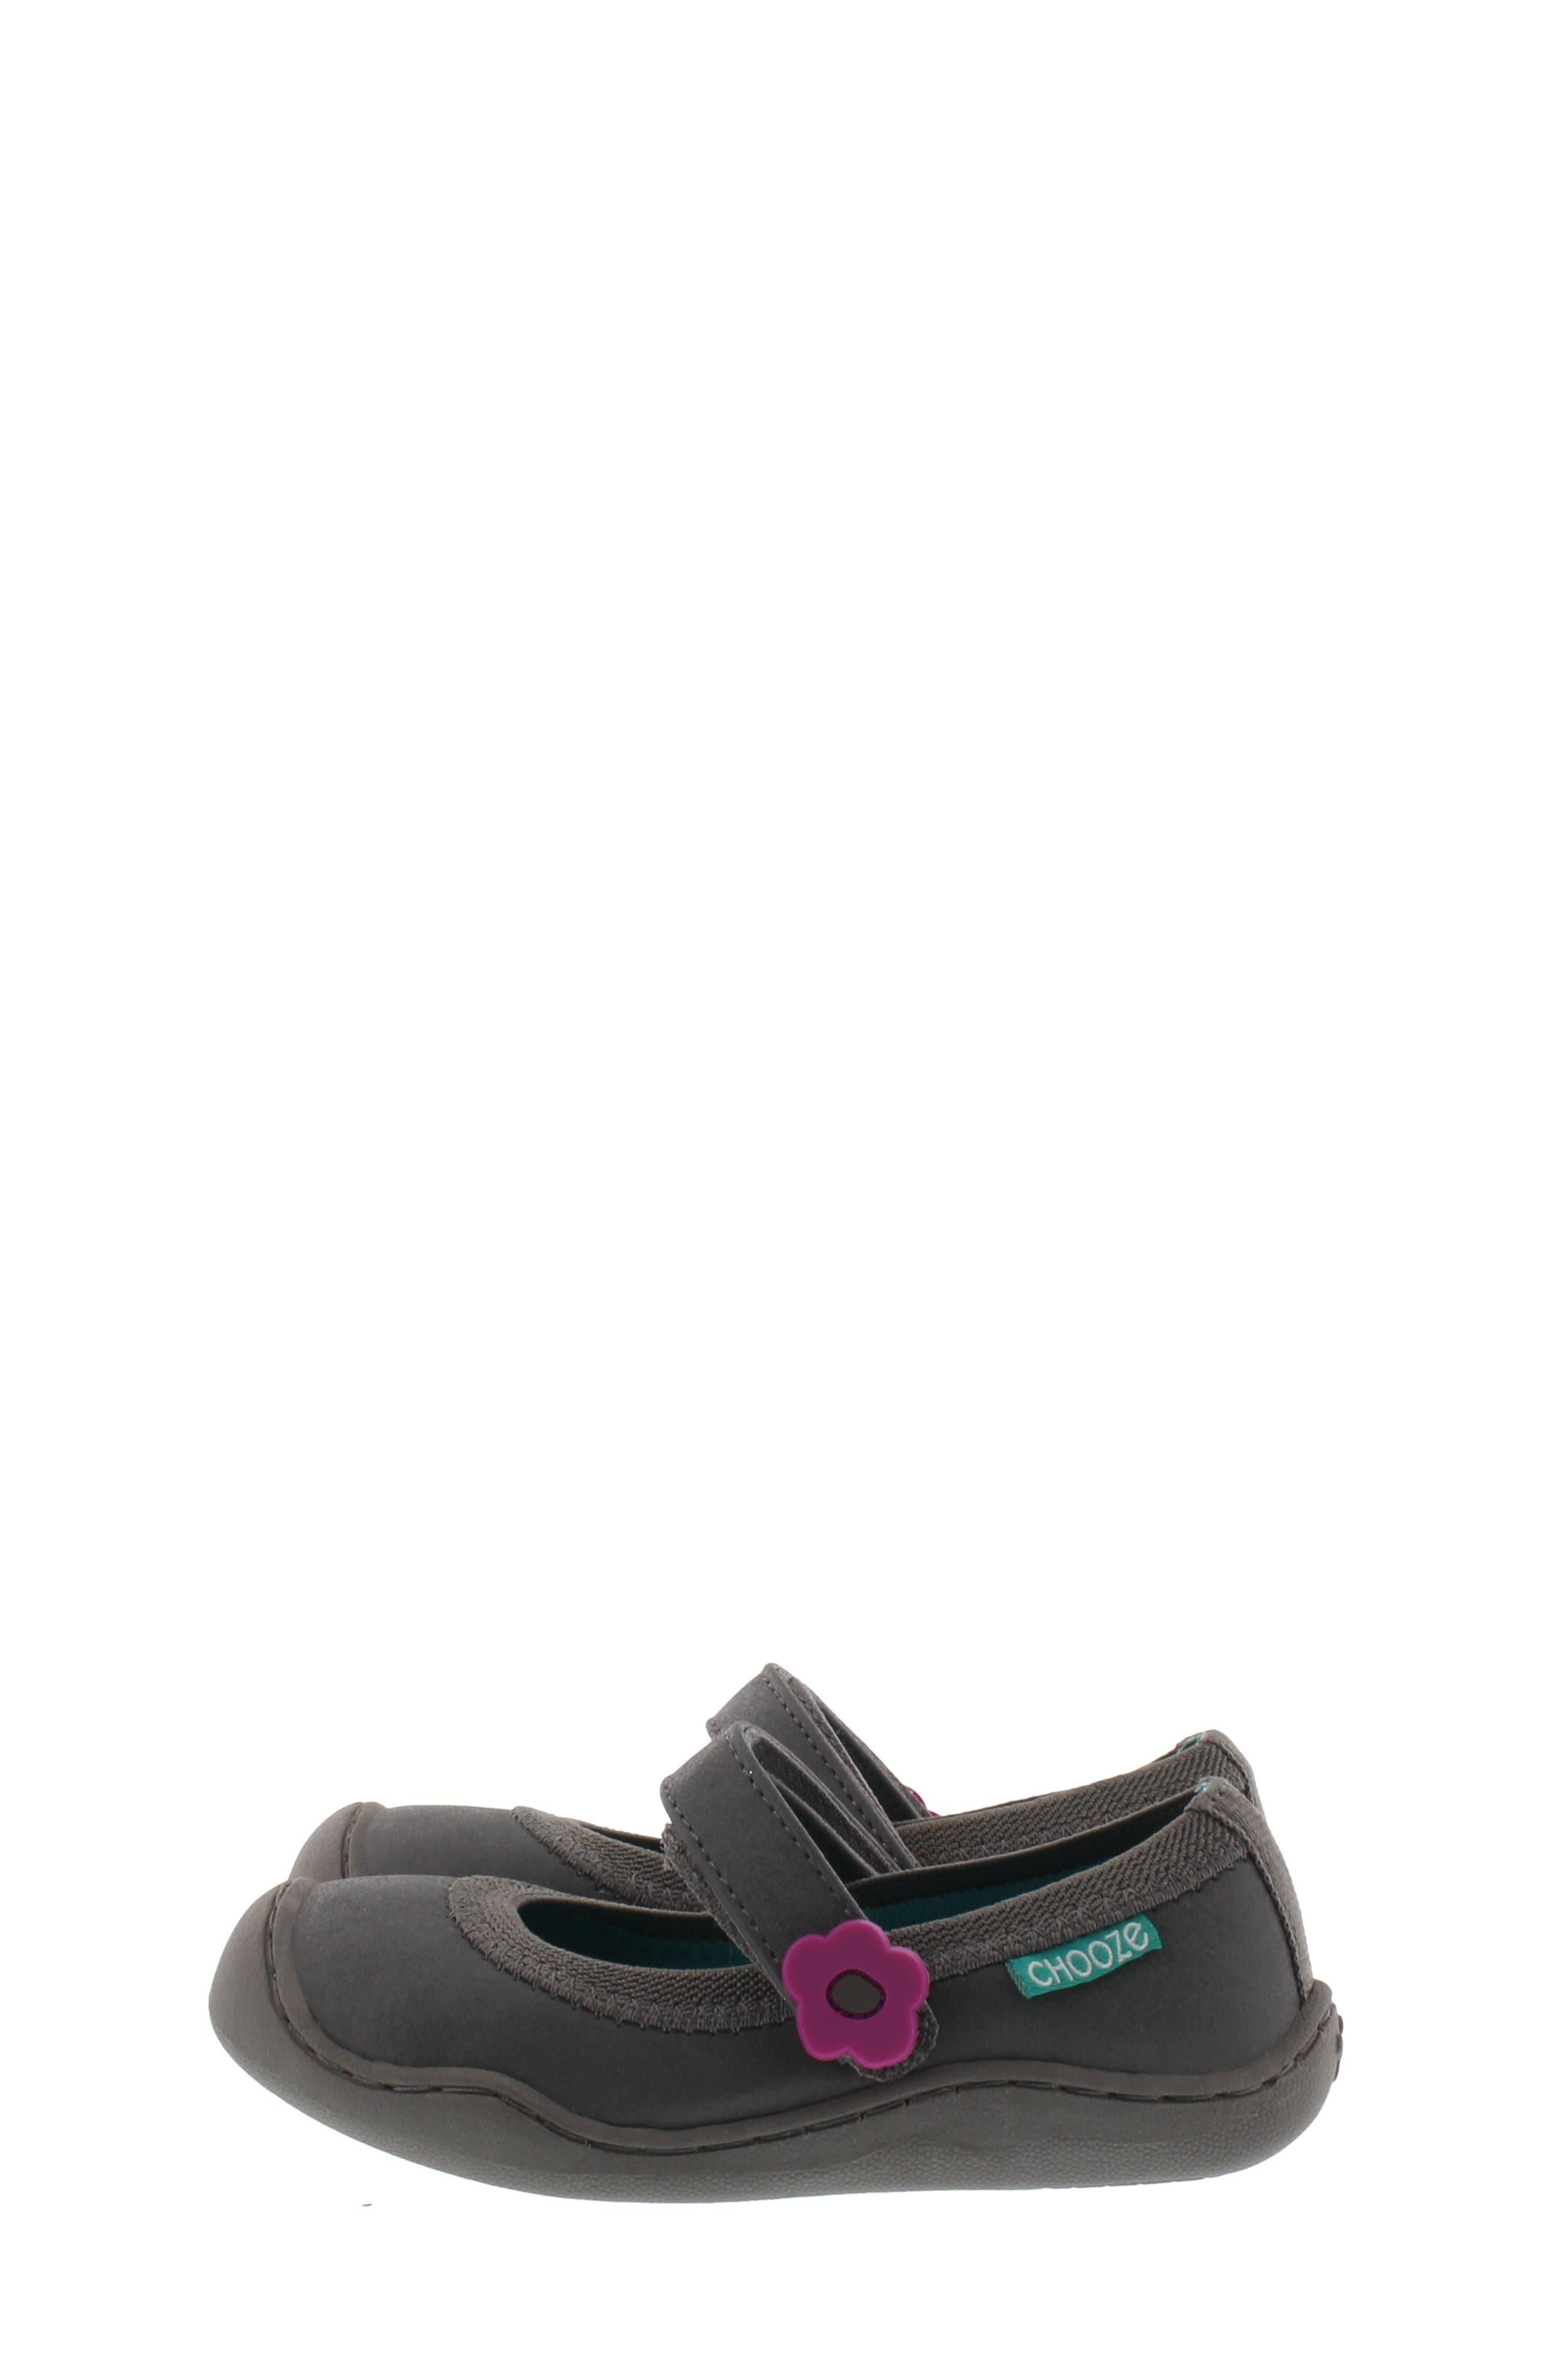 Steady Shimmer Mary Jane Sneaker,                             Alternate thumbnail 3, color,                             PEWTER